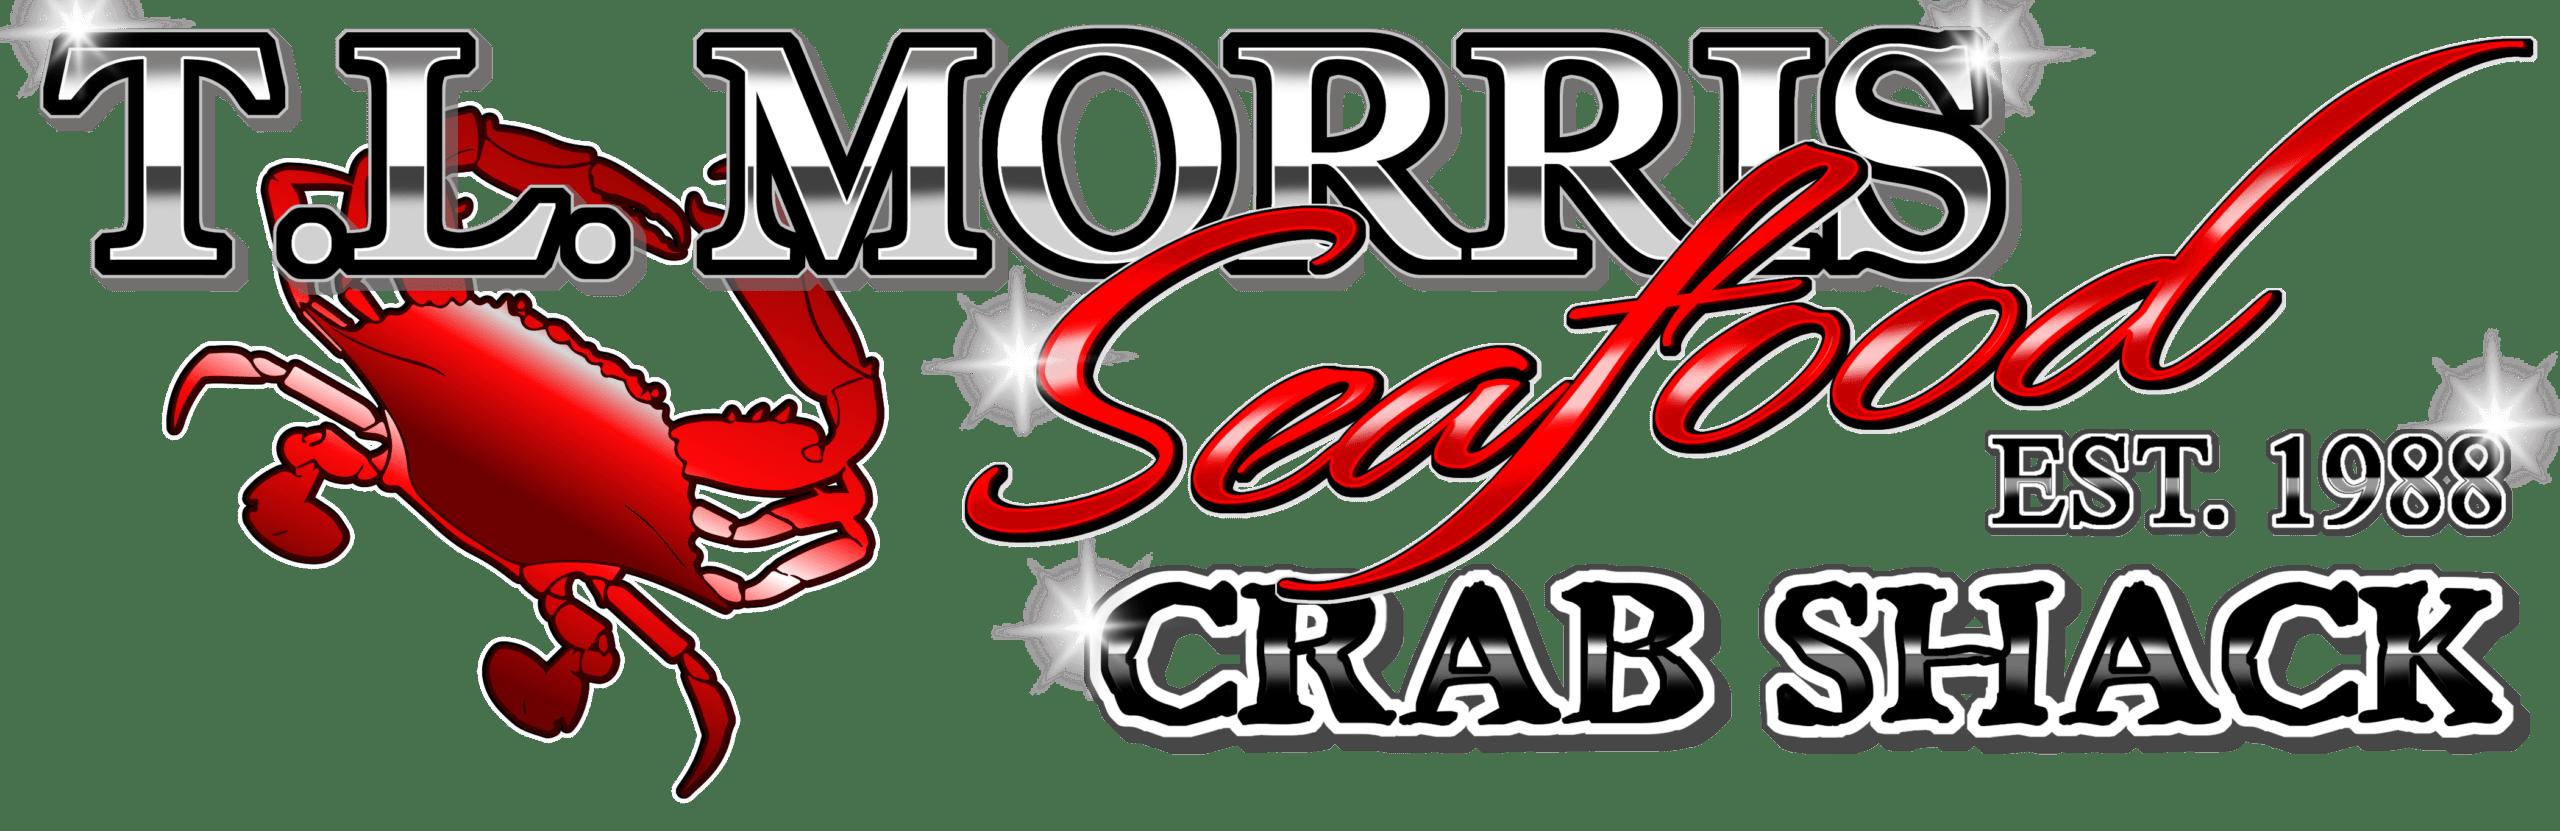 T.L. Morris Seafood